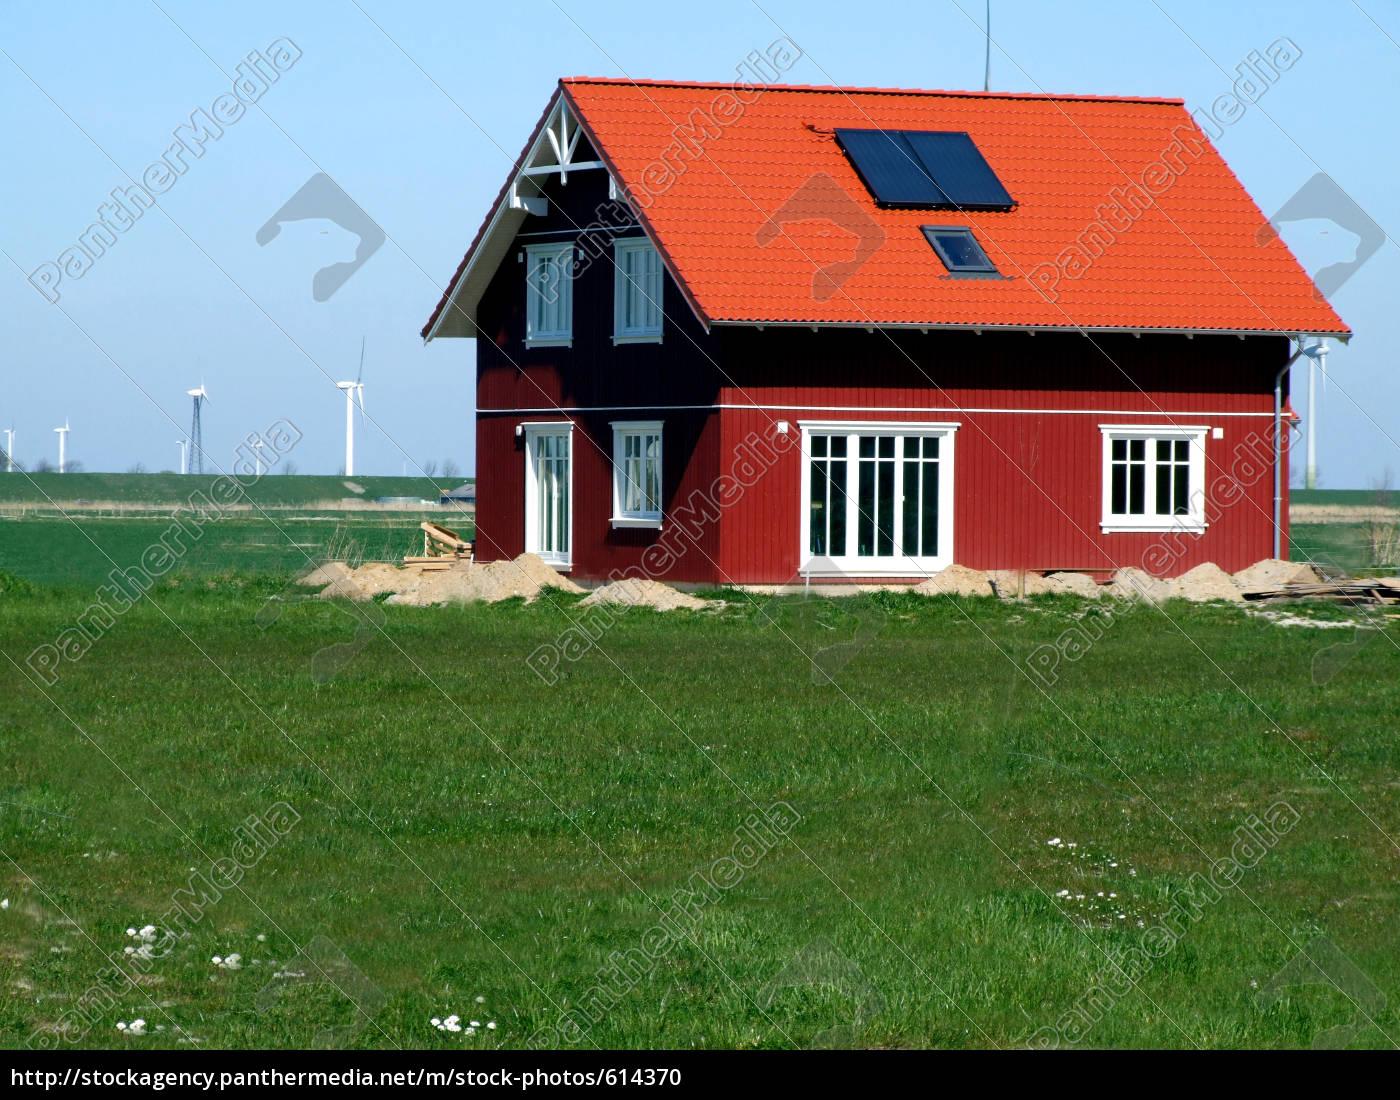 woodhouse - 614370